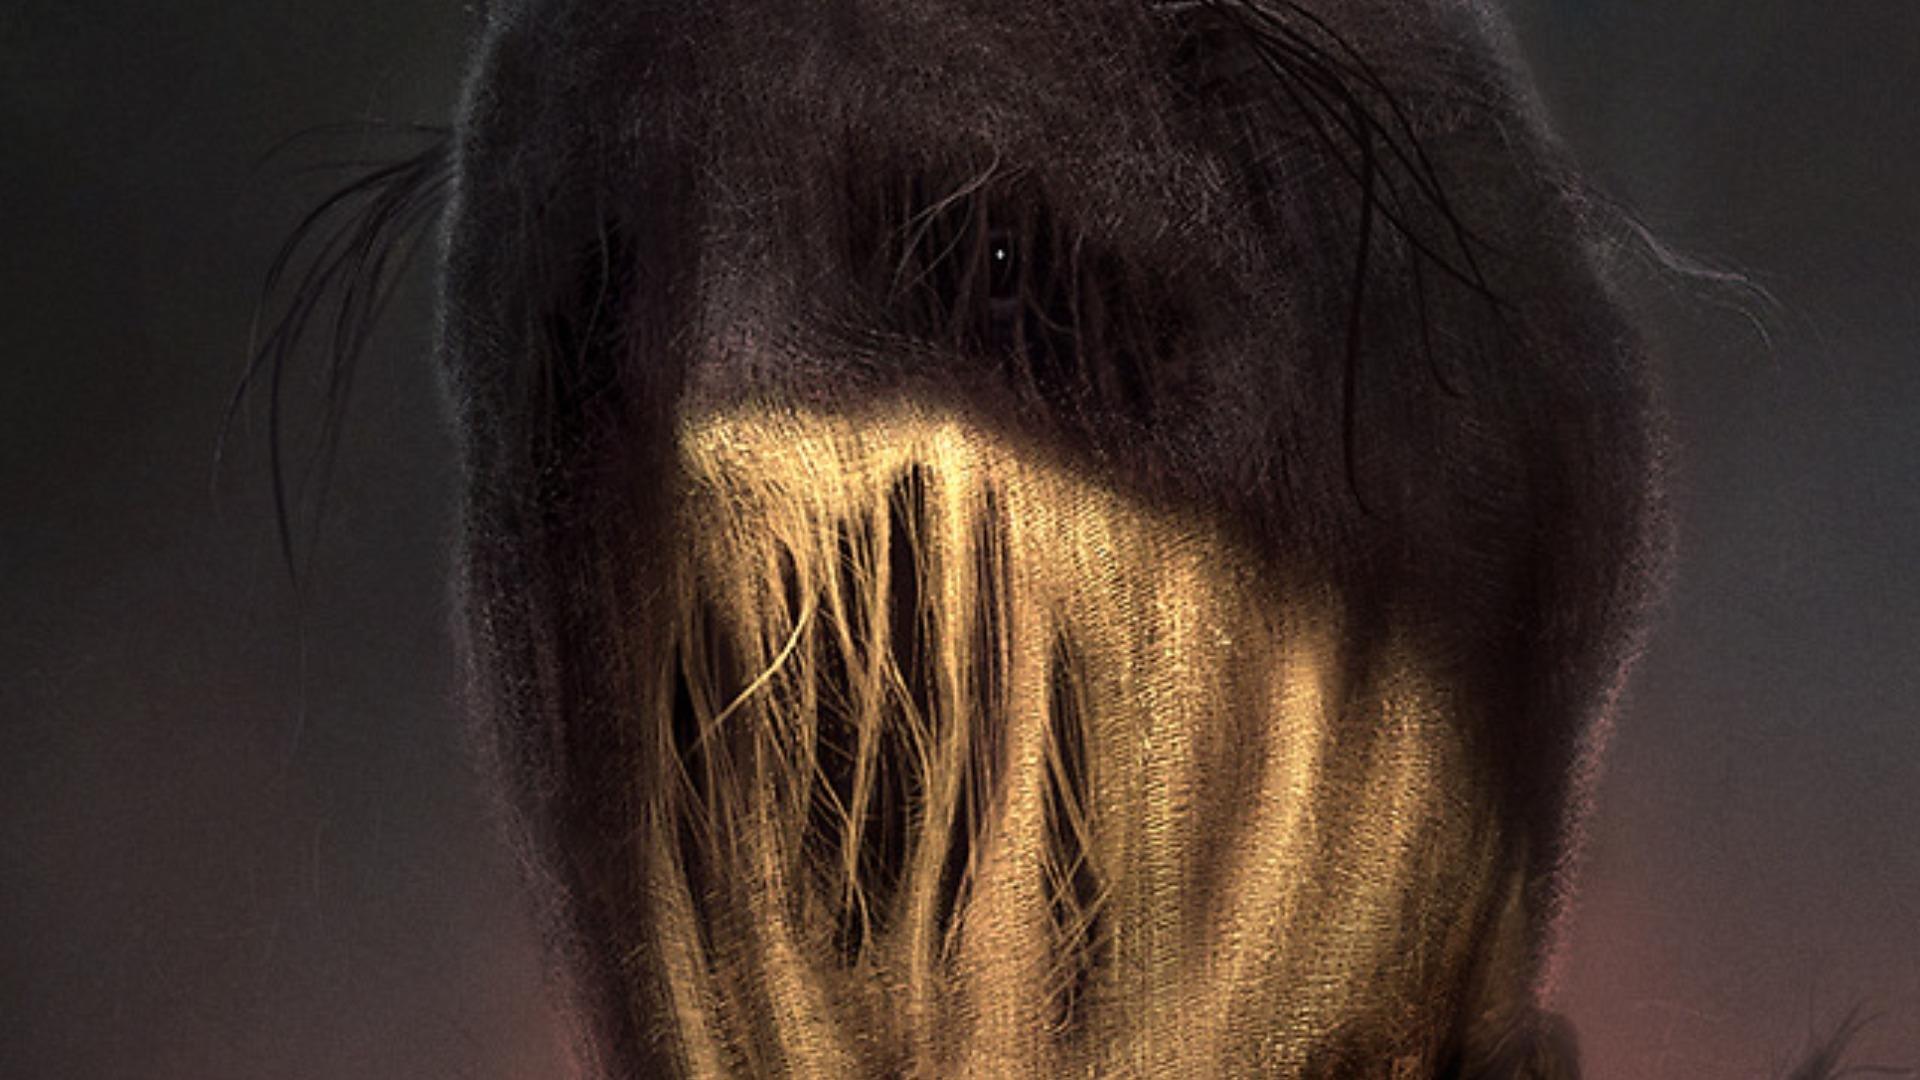 Scarecrow batman wallpaper 1920x1080 280981 WallpaperUP 1920x1080